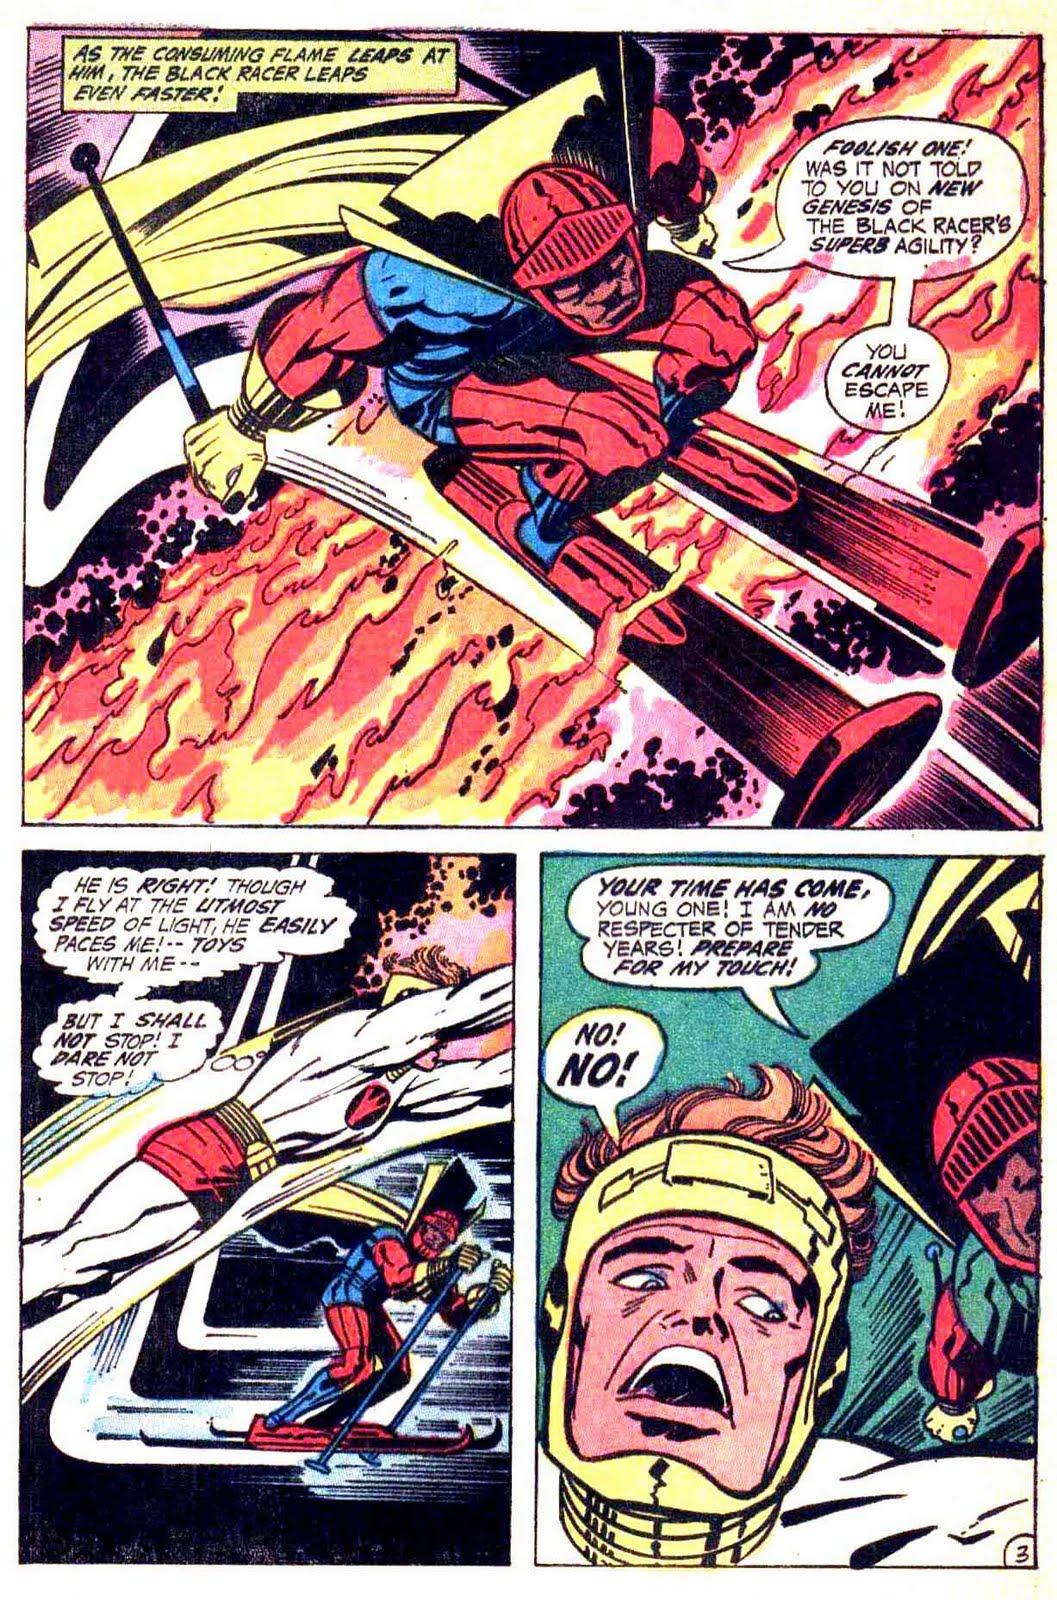 New Gods v1 #3 dc bronze age comic book page art by Jack Kirby